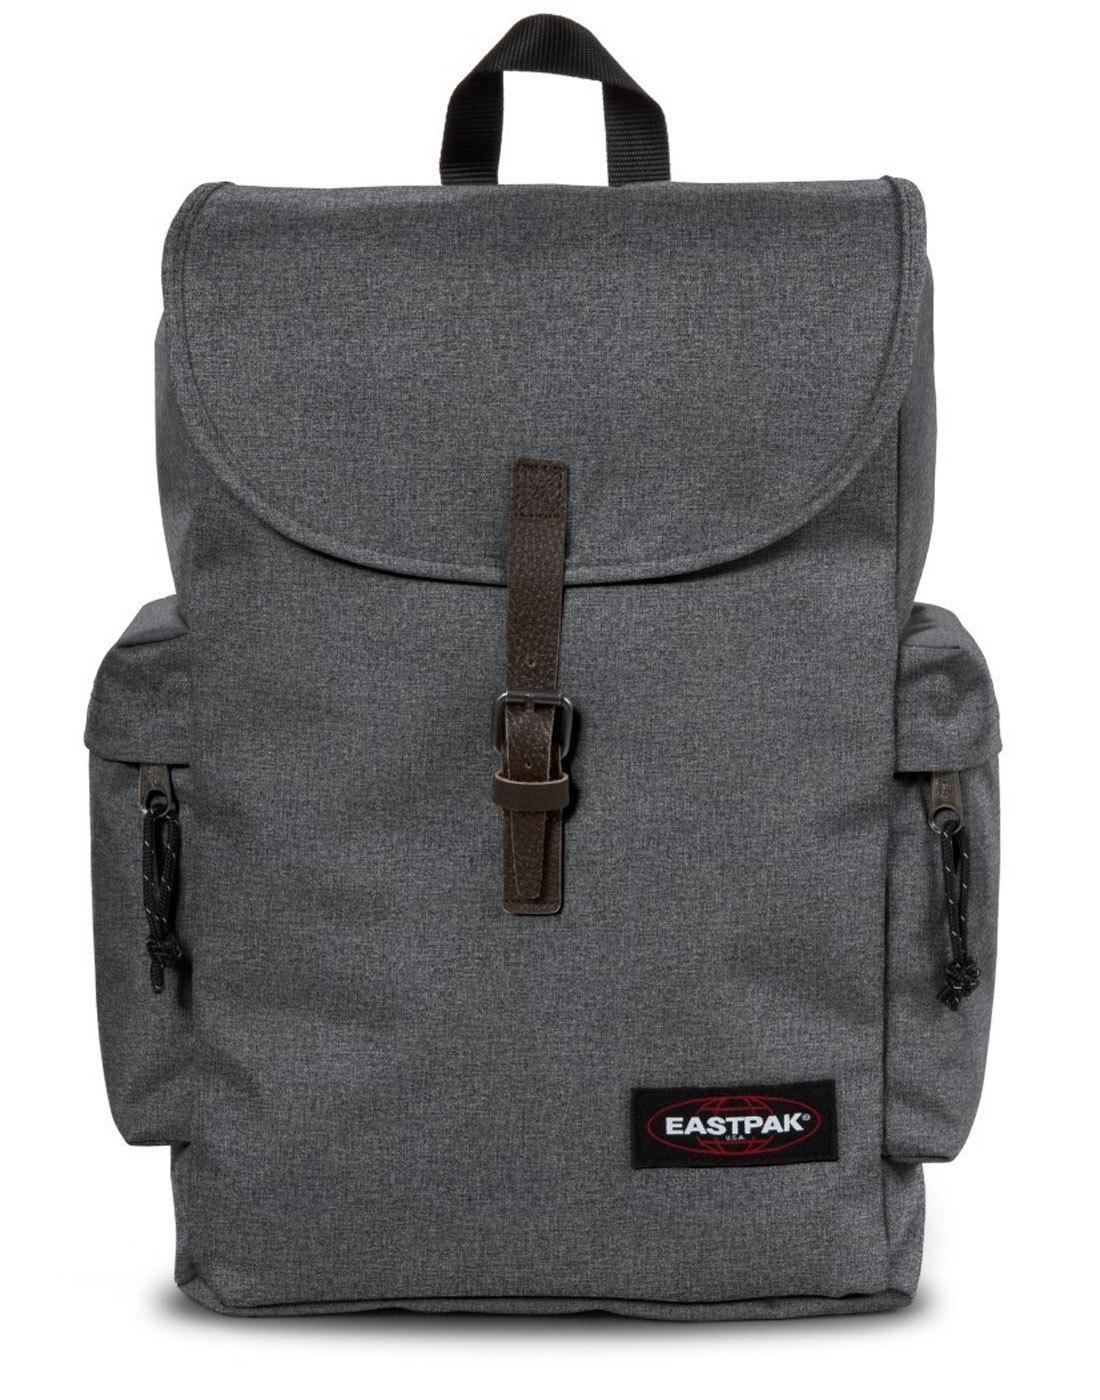 Austin EASTPAK Retro Laptop Backpack - Black Denim